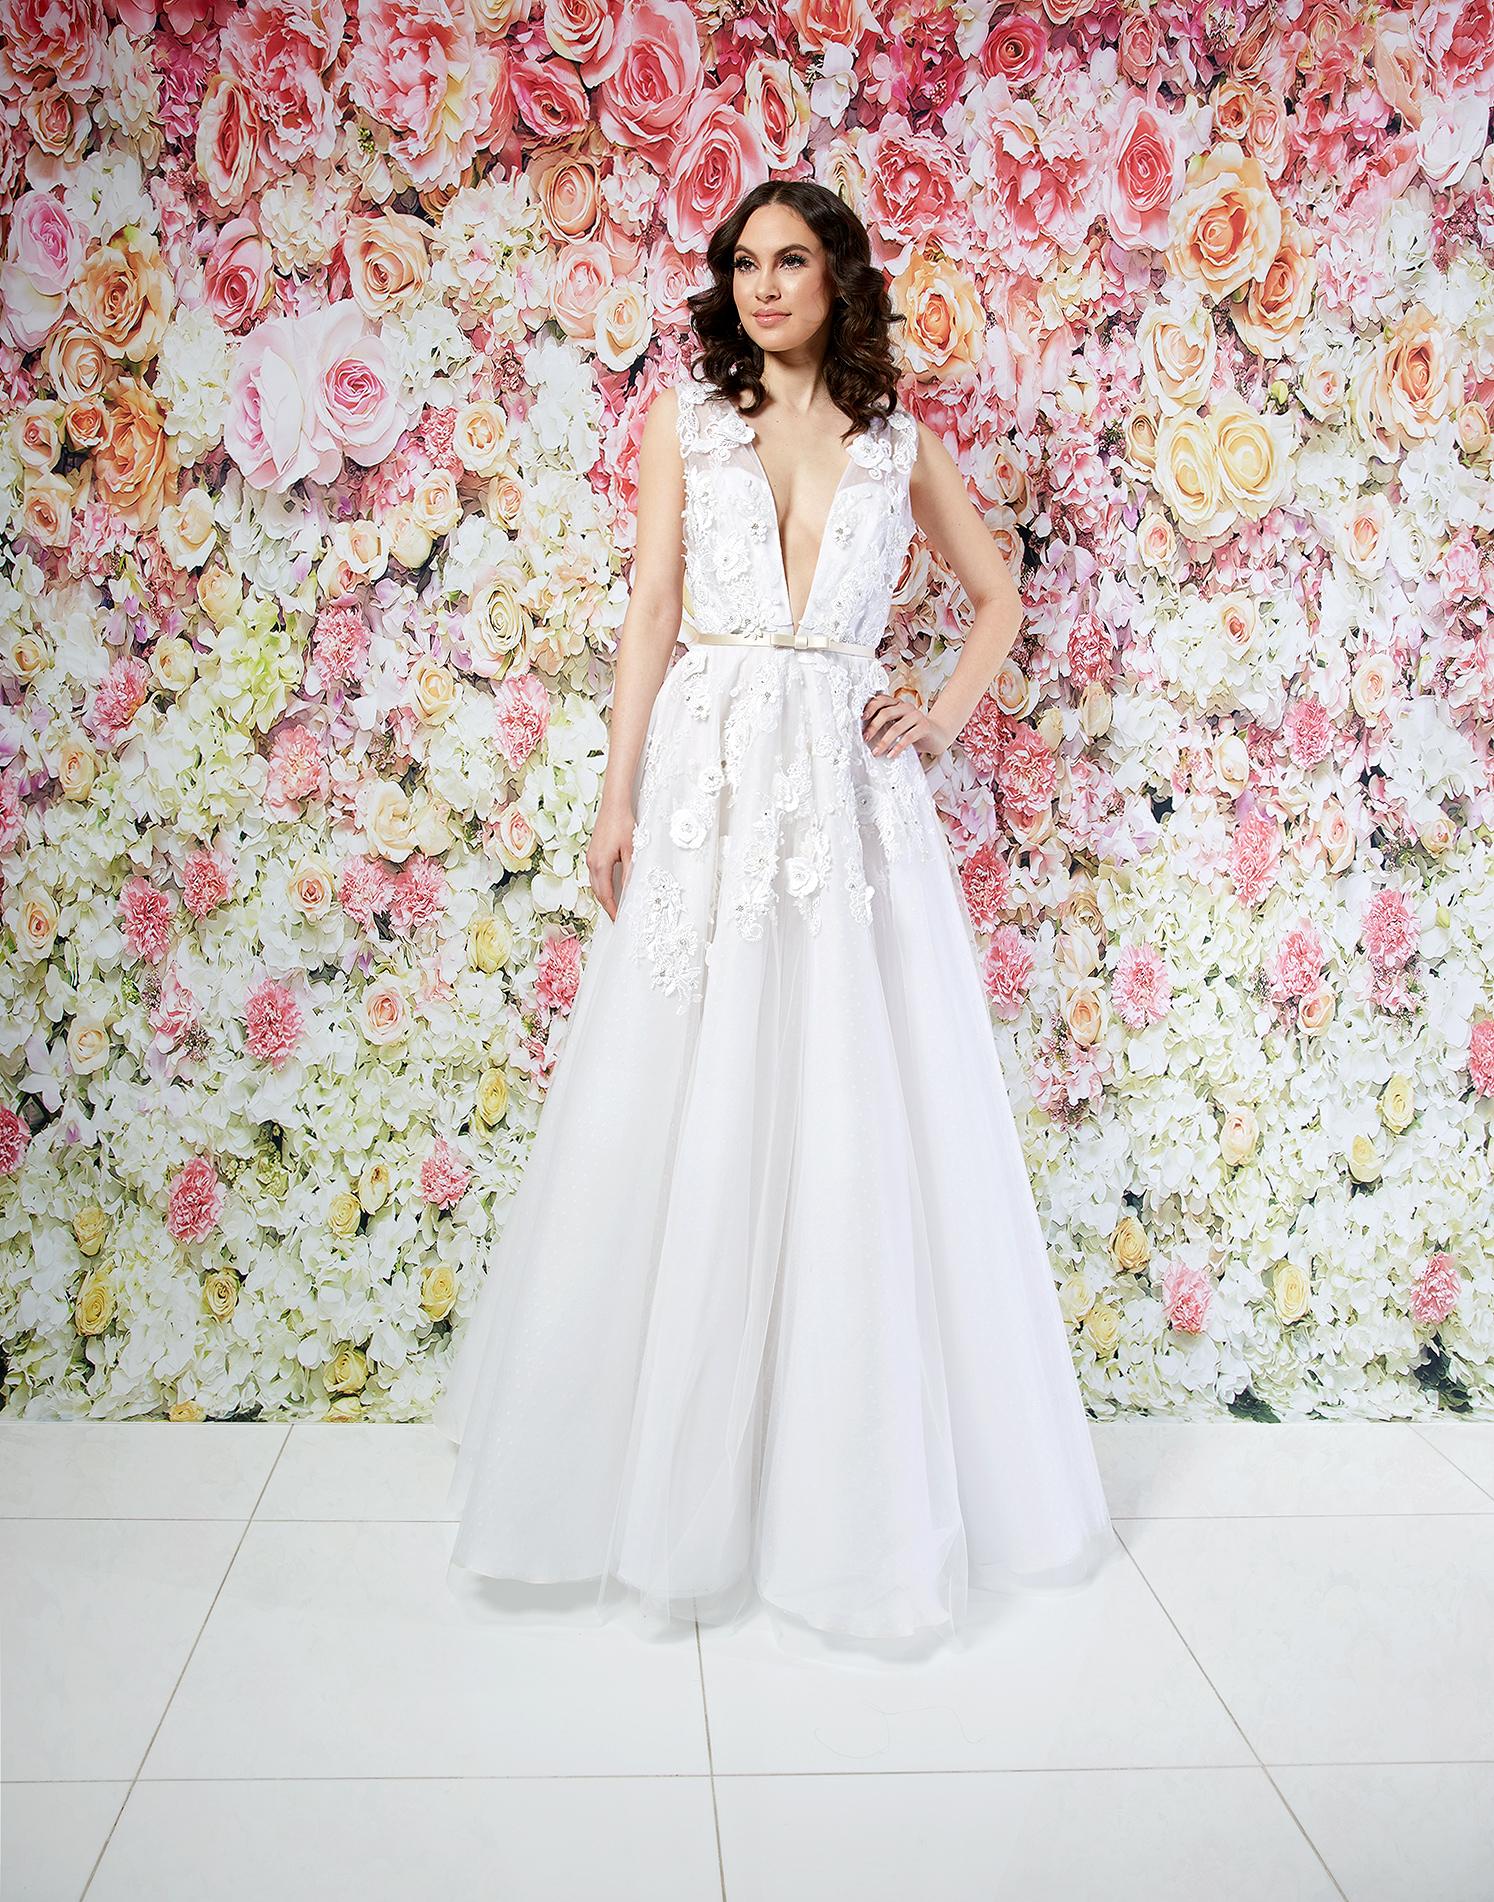 randi rahm wedding dress spring 2019 plunging neck applique a-line